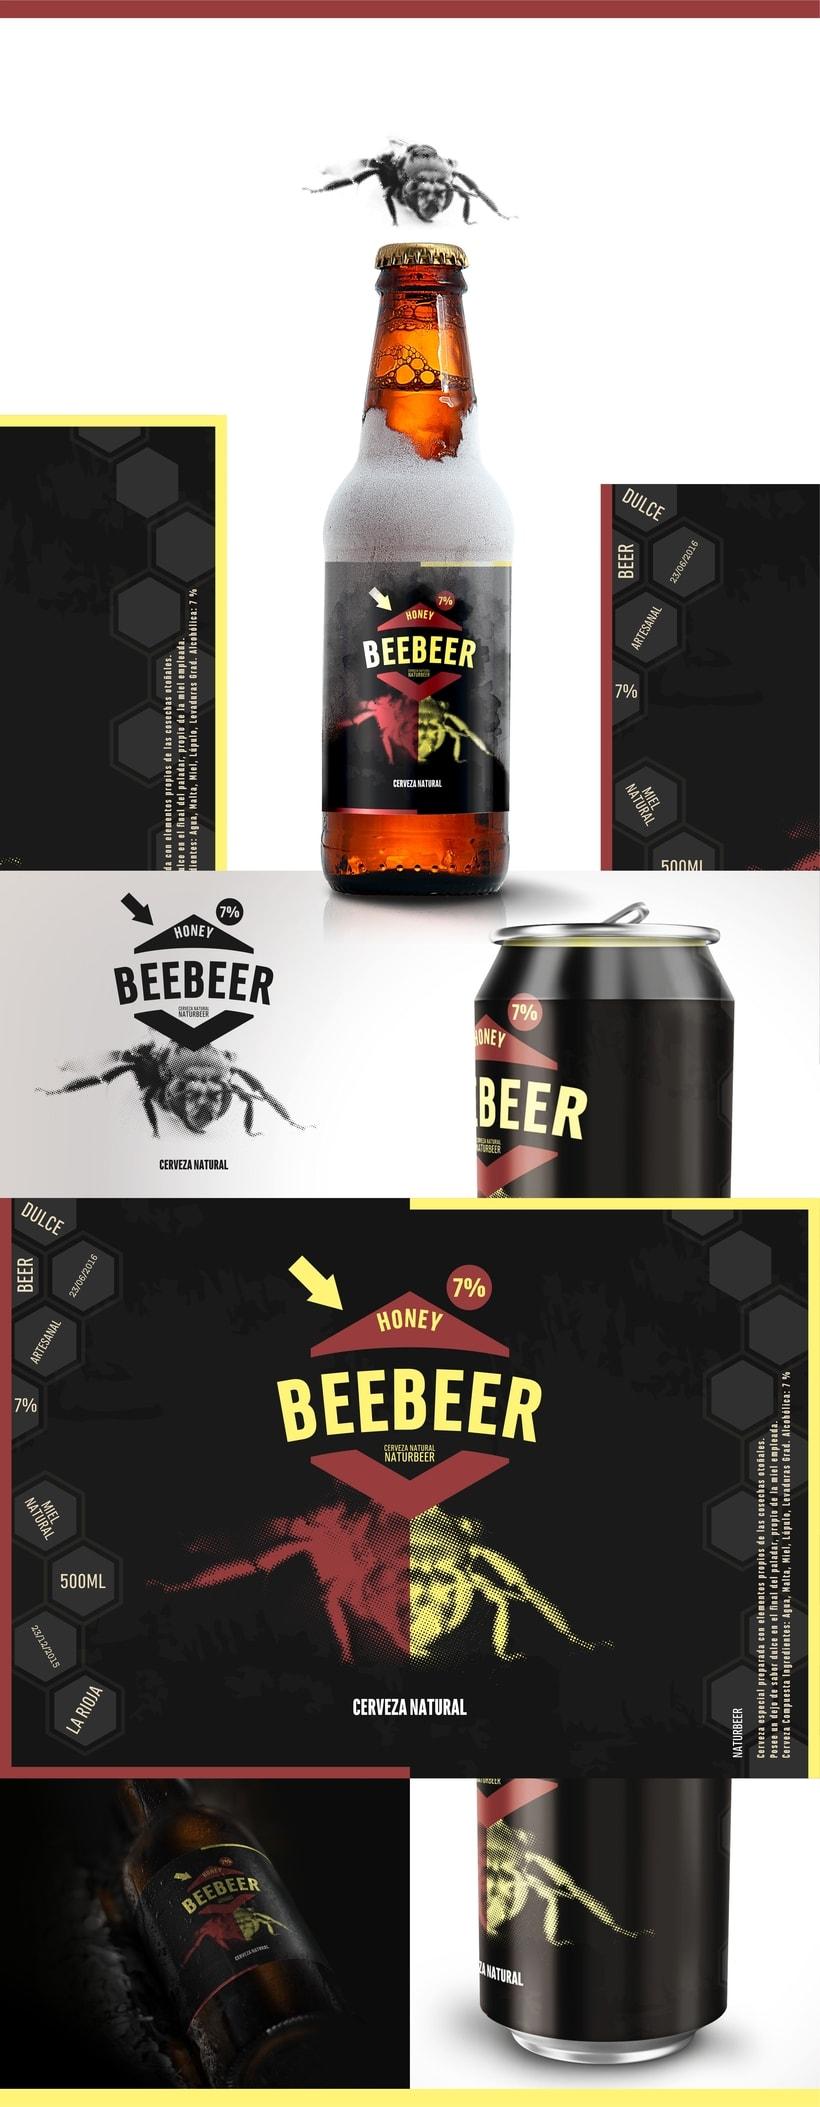 BEEBEER Cerveza Artesanal 0